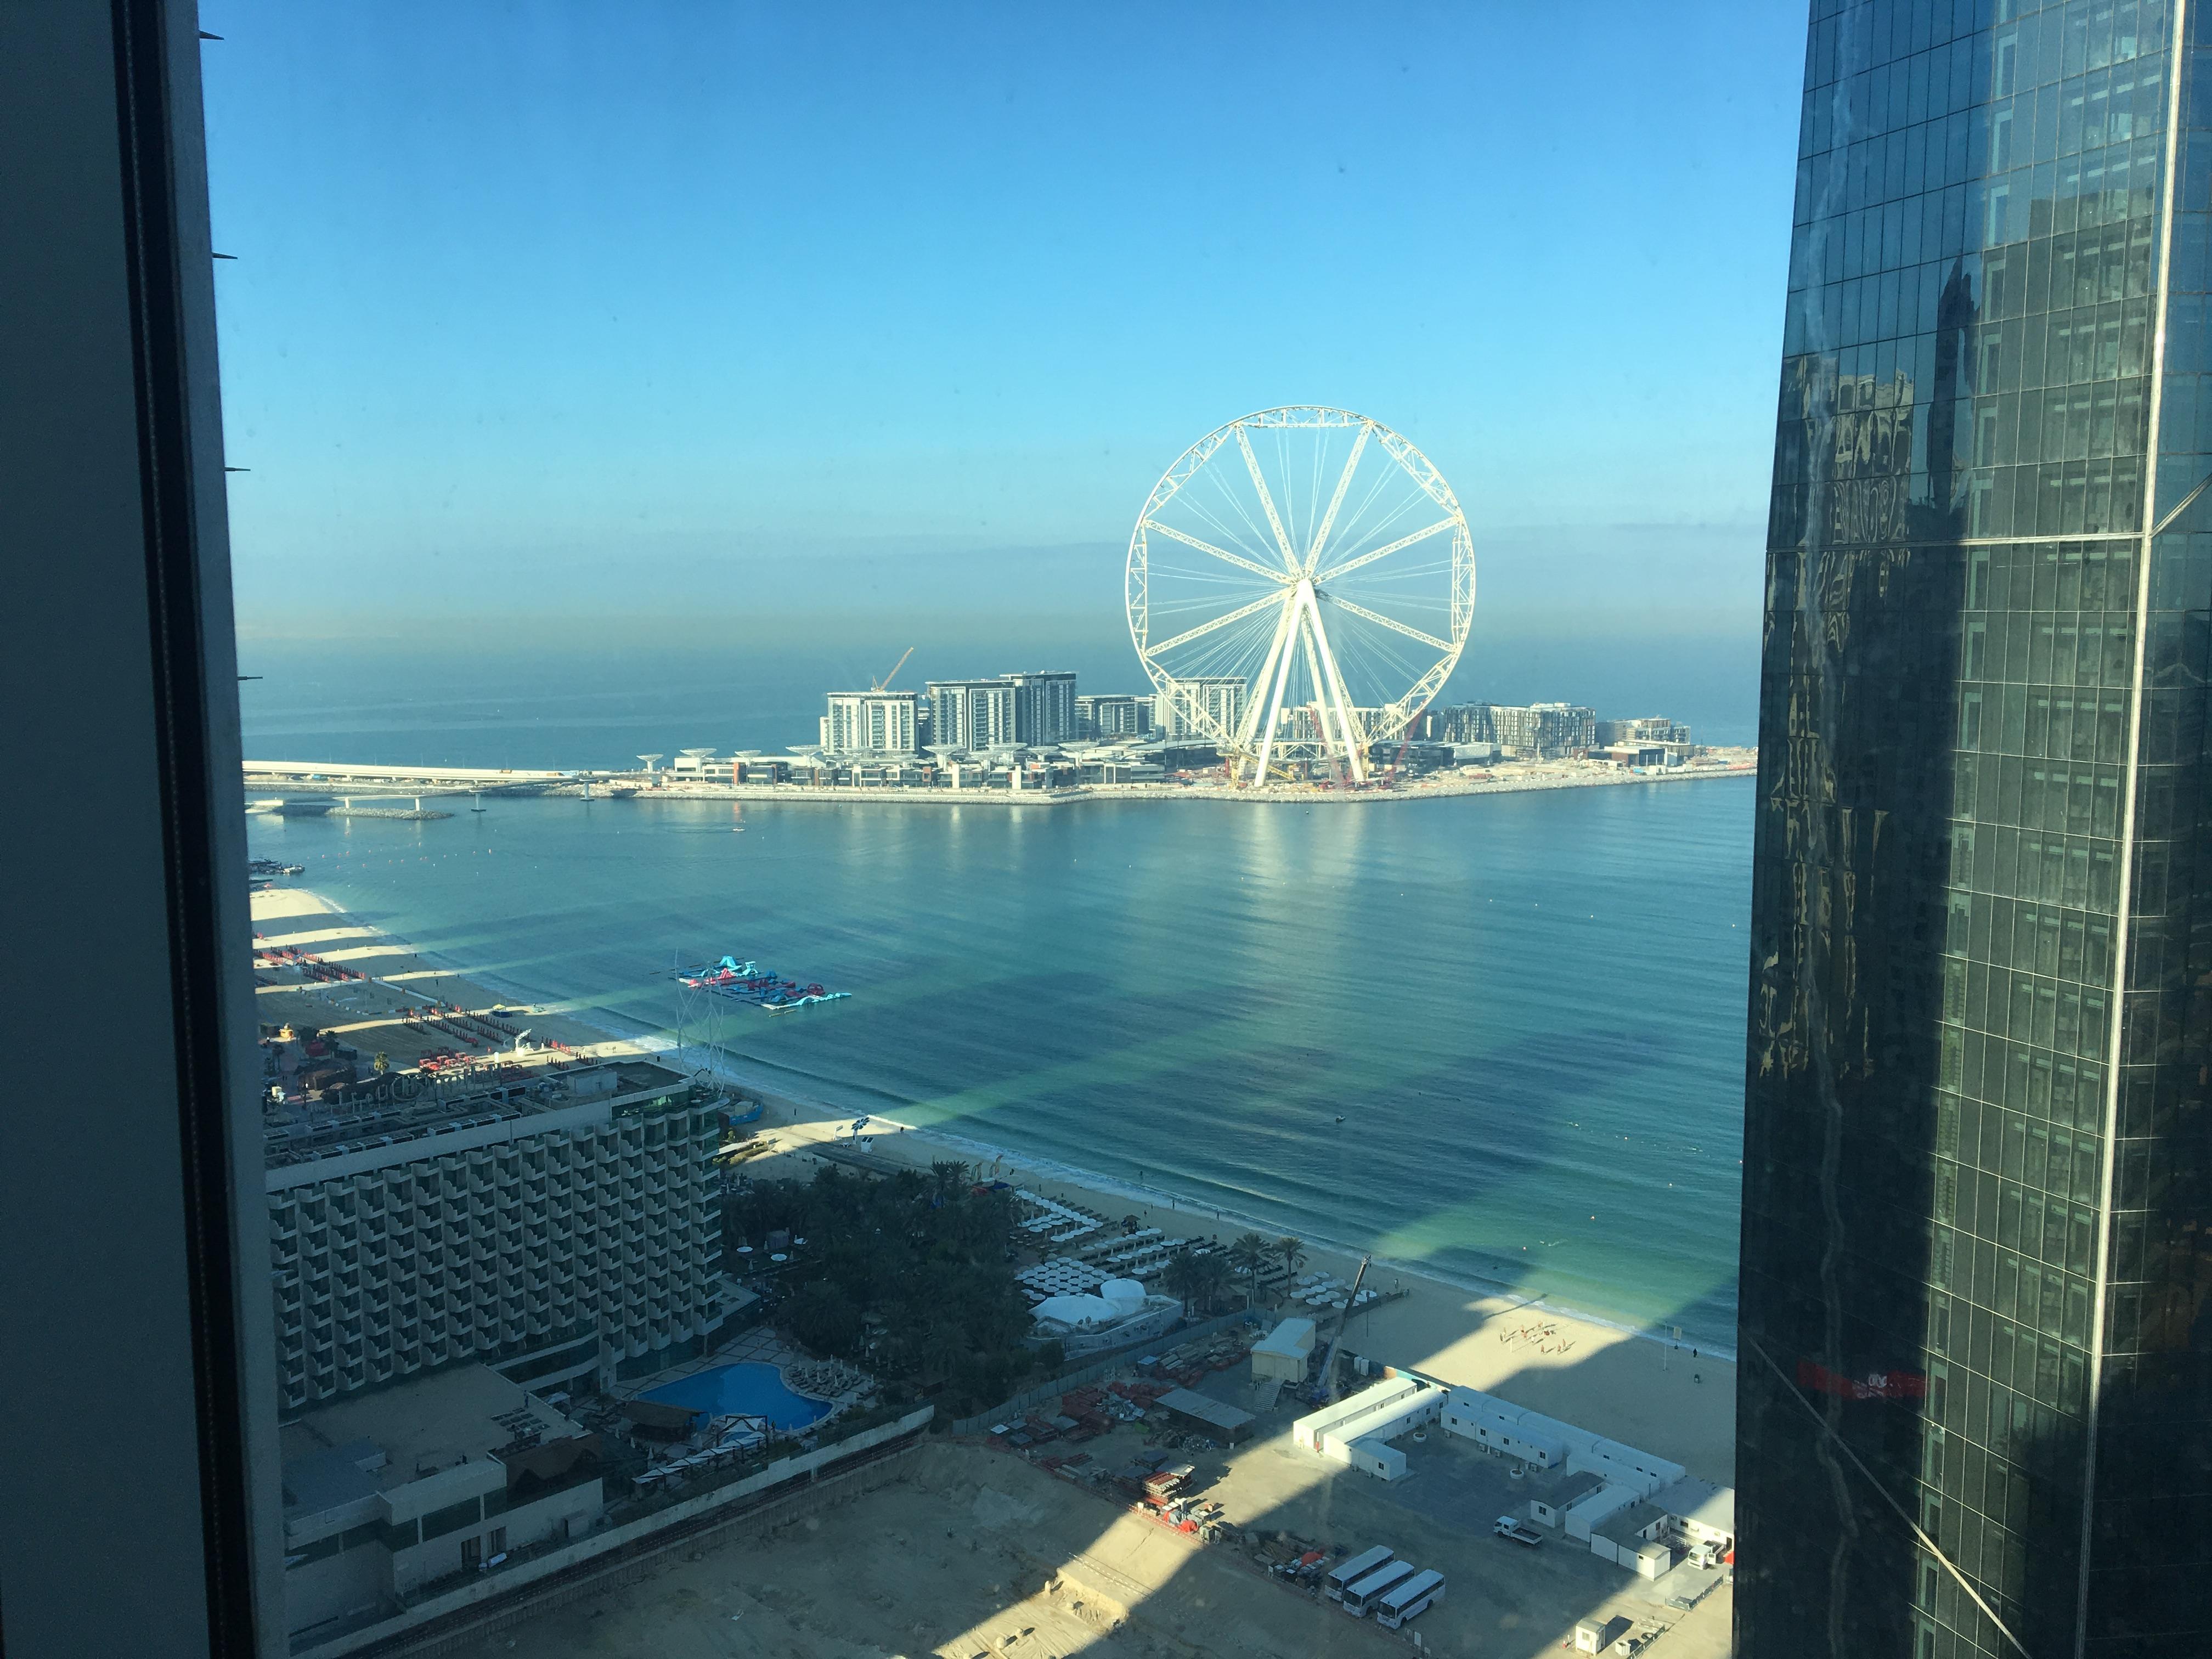 Ja oasis beach tower дубай как добраться из аэропорта шарджи в дубай